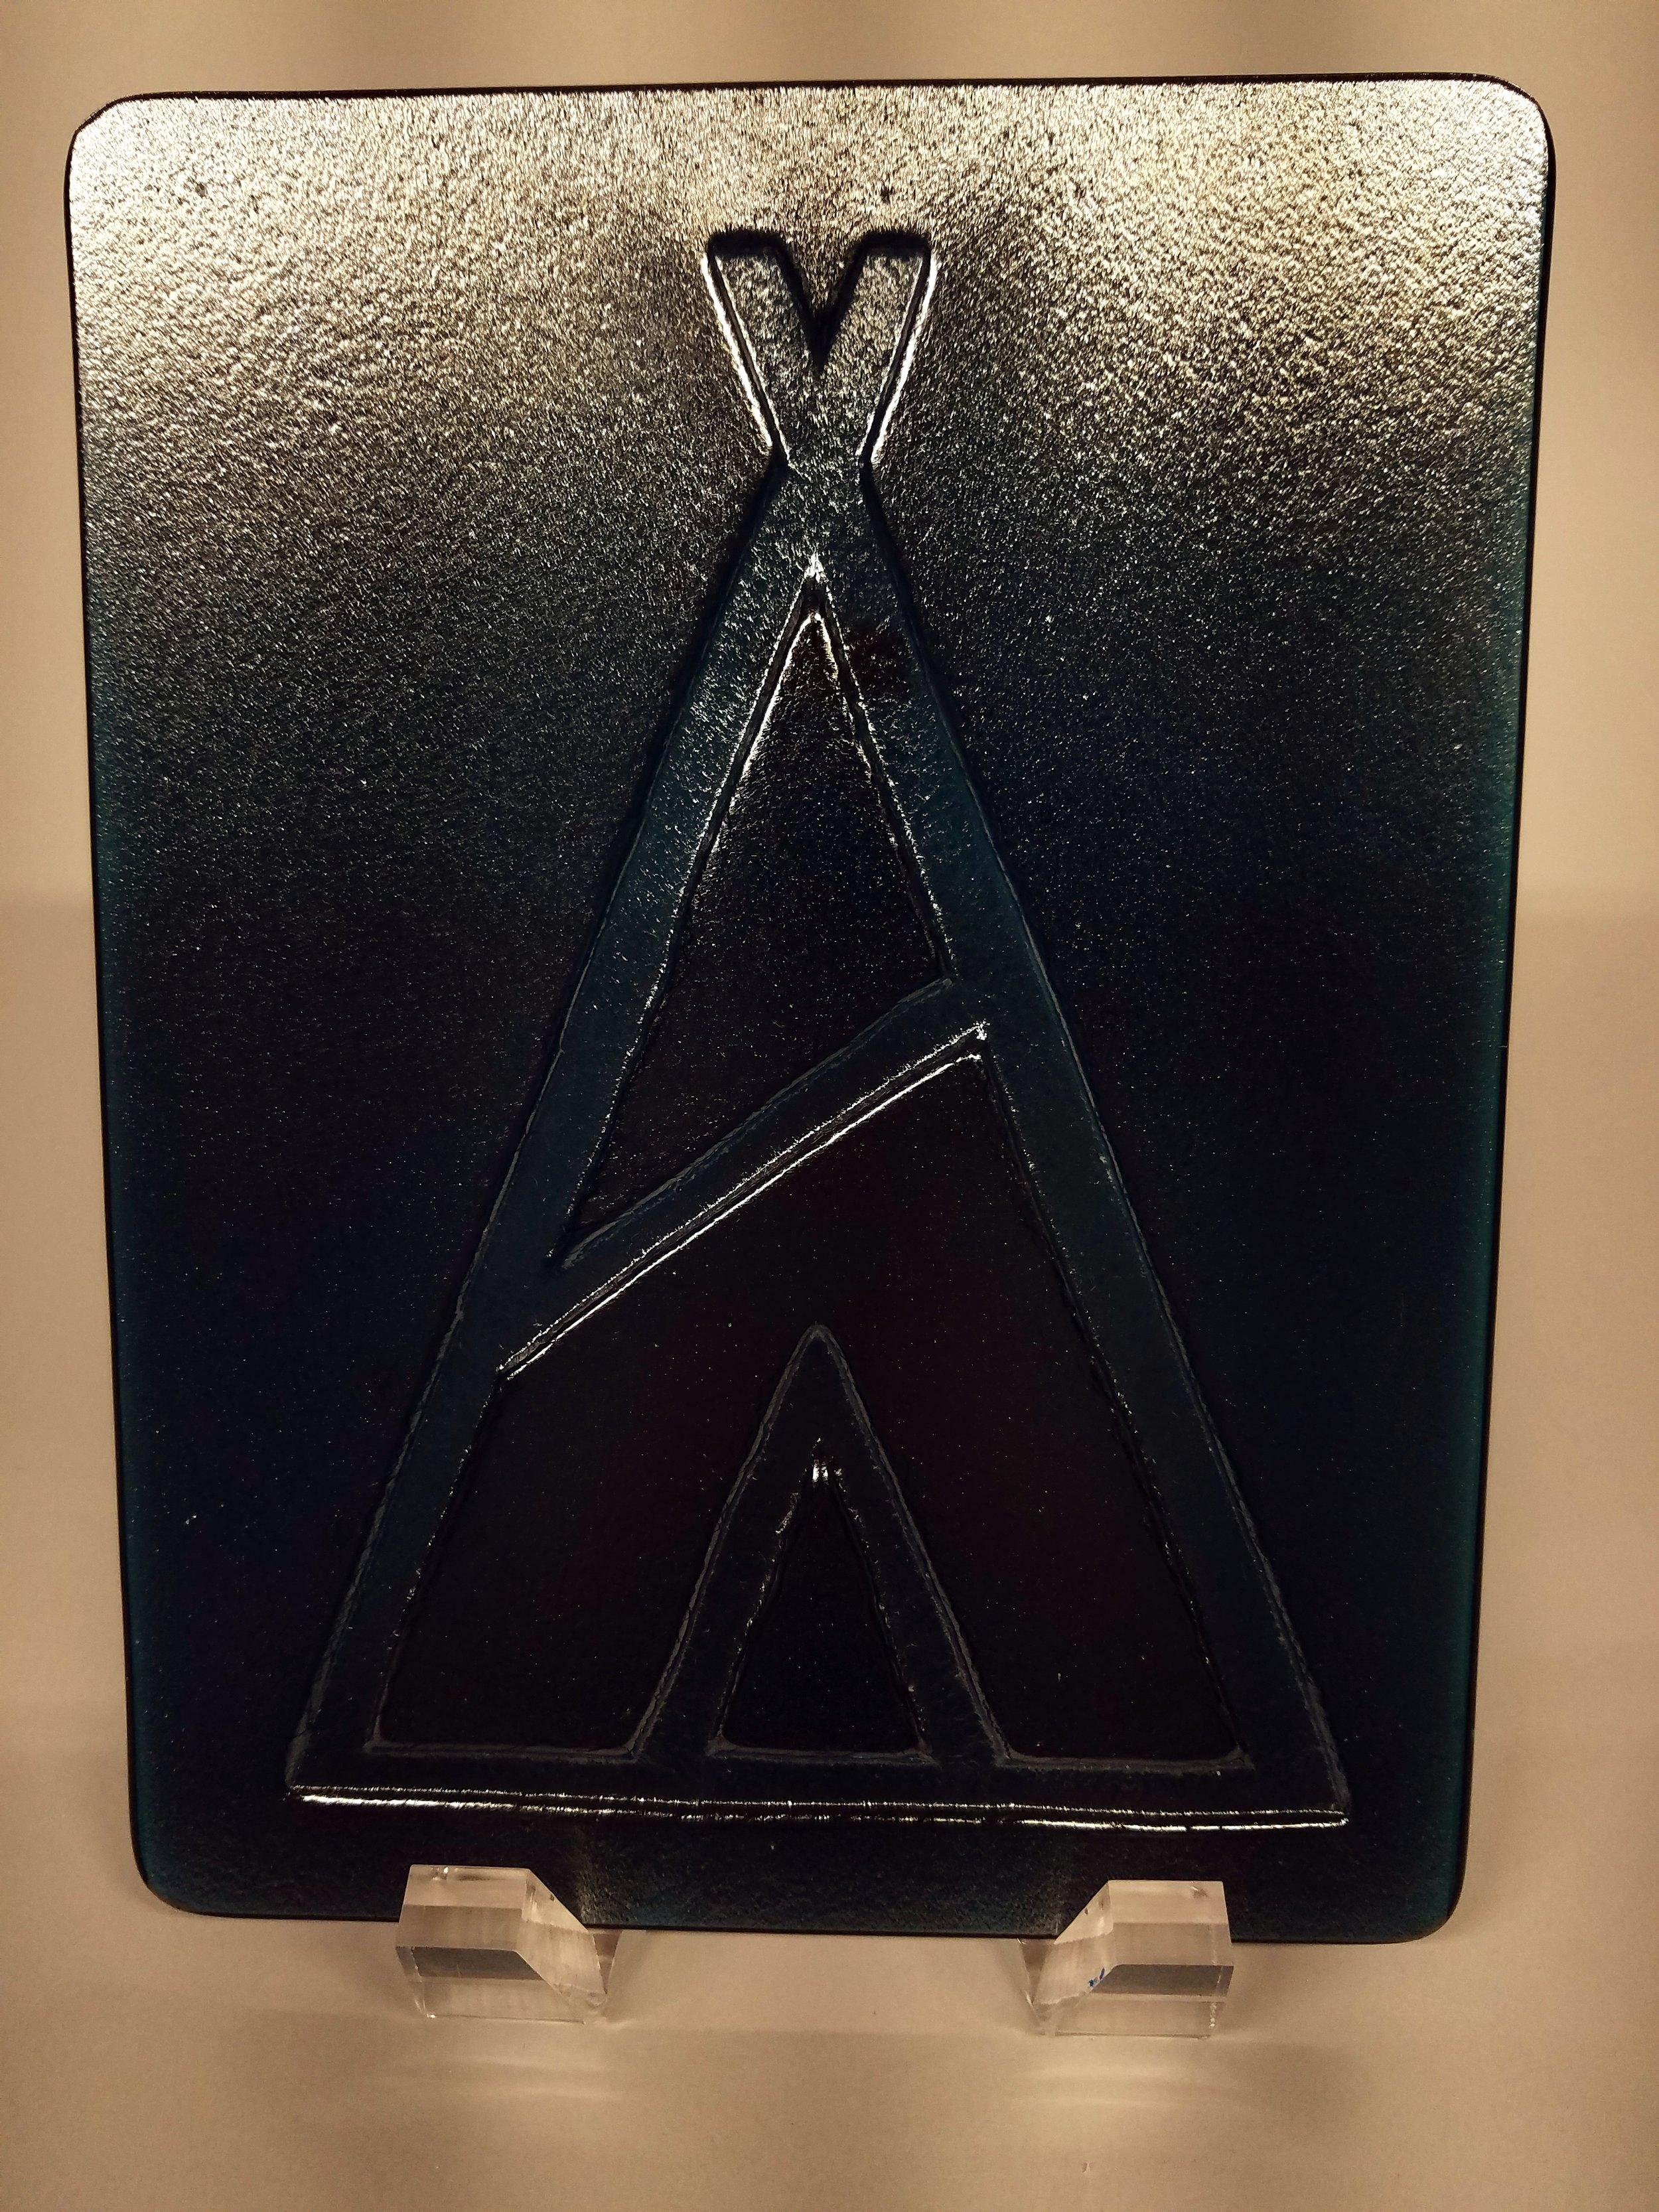 Salon logo for recent opening. Aquamarine glass.